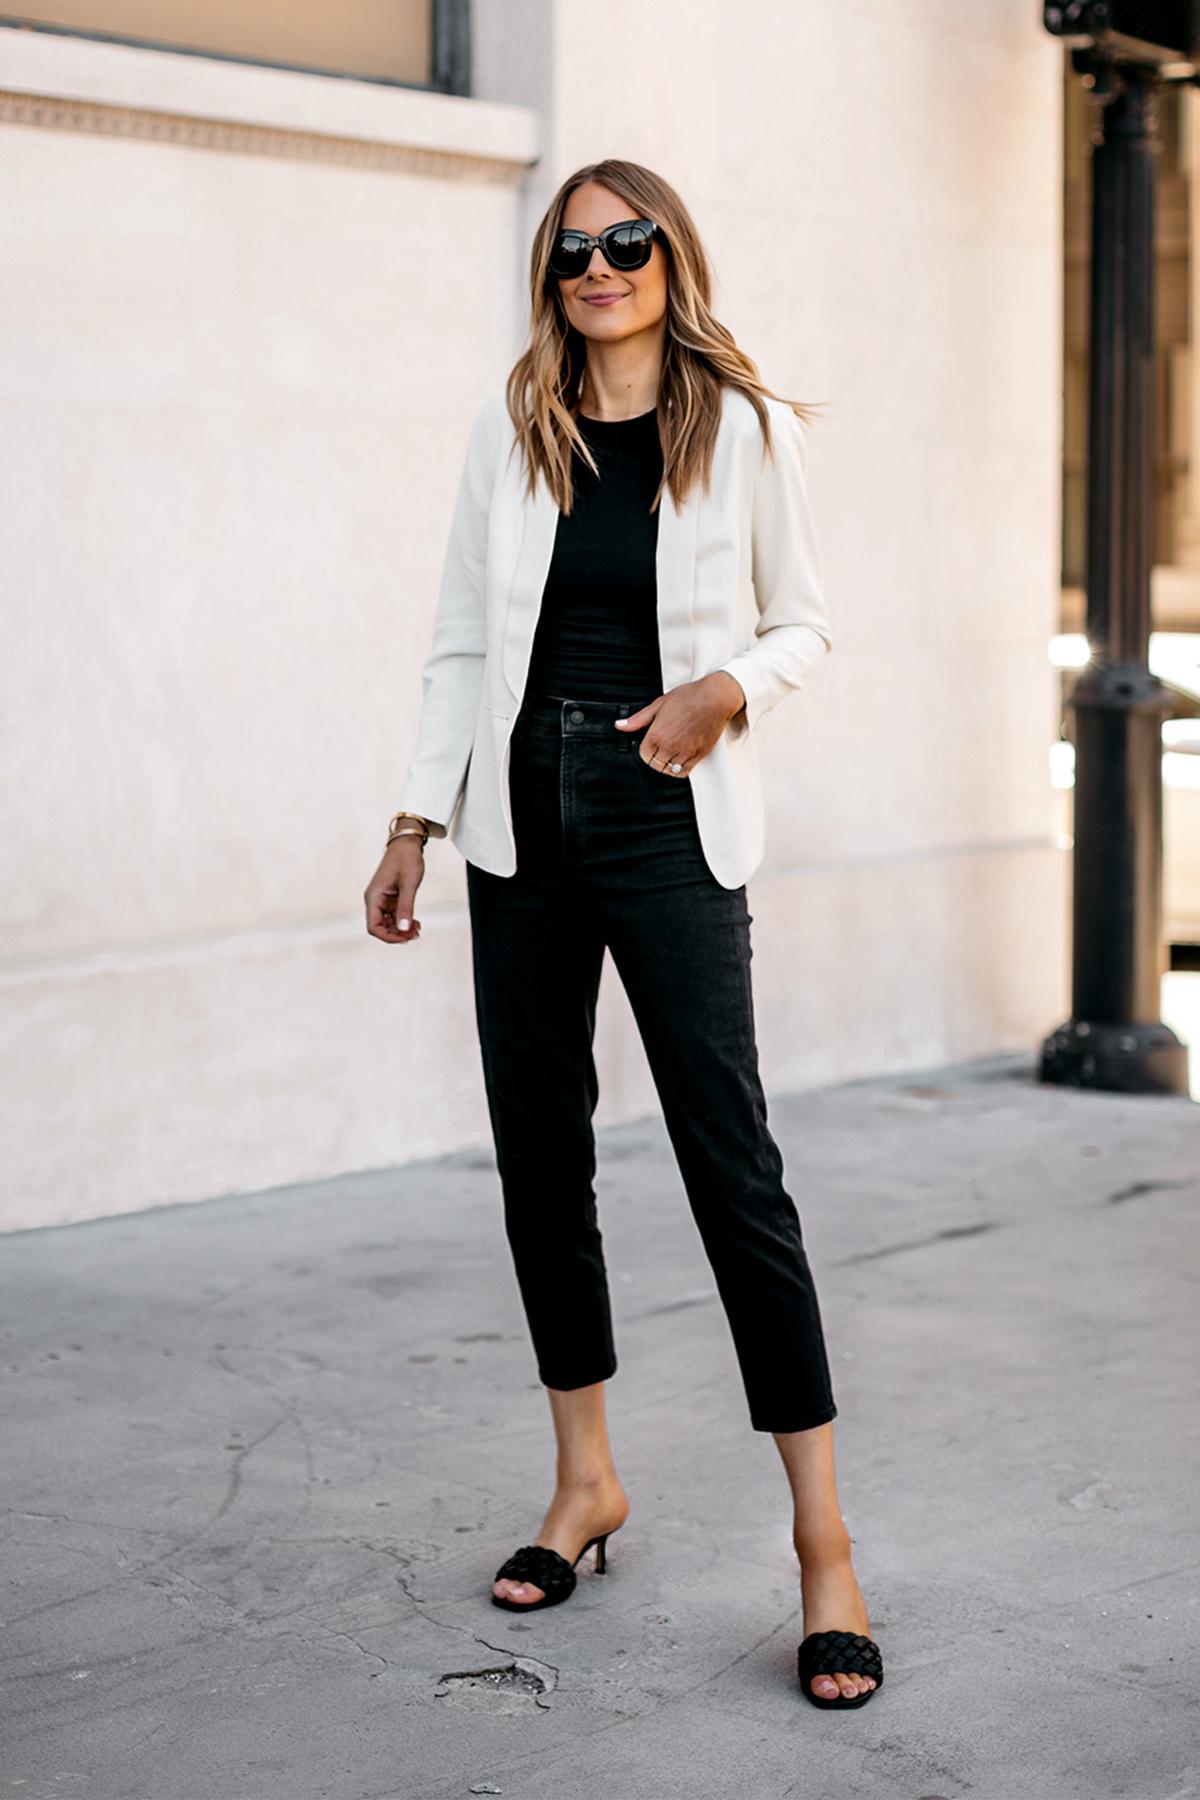 Fashion Jackson Wearing Express White Blazer Black Bodysuit Black Jeans Black Heeled Sandals Modern Workwear Outfit